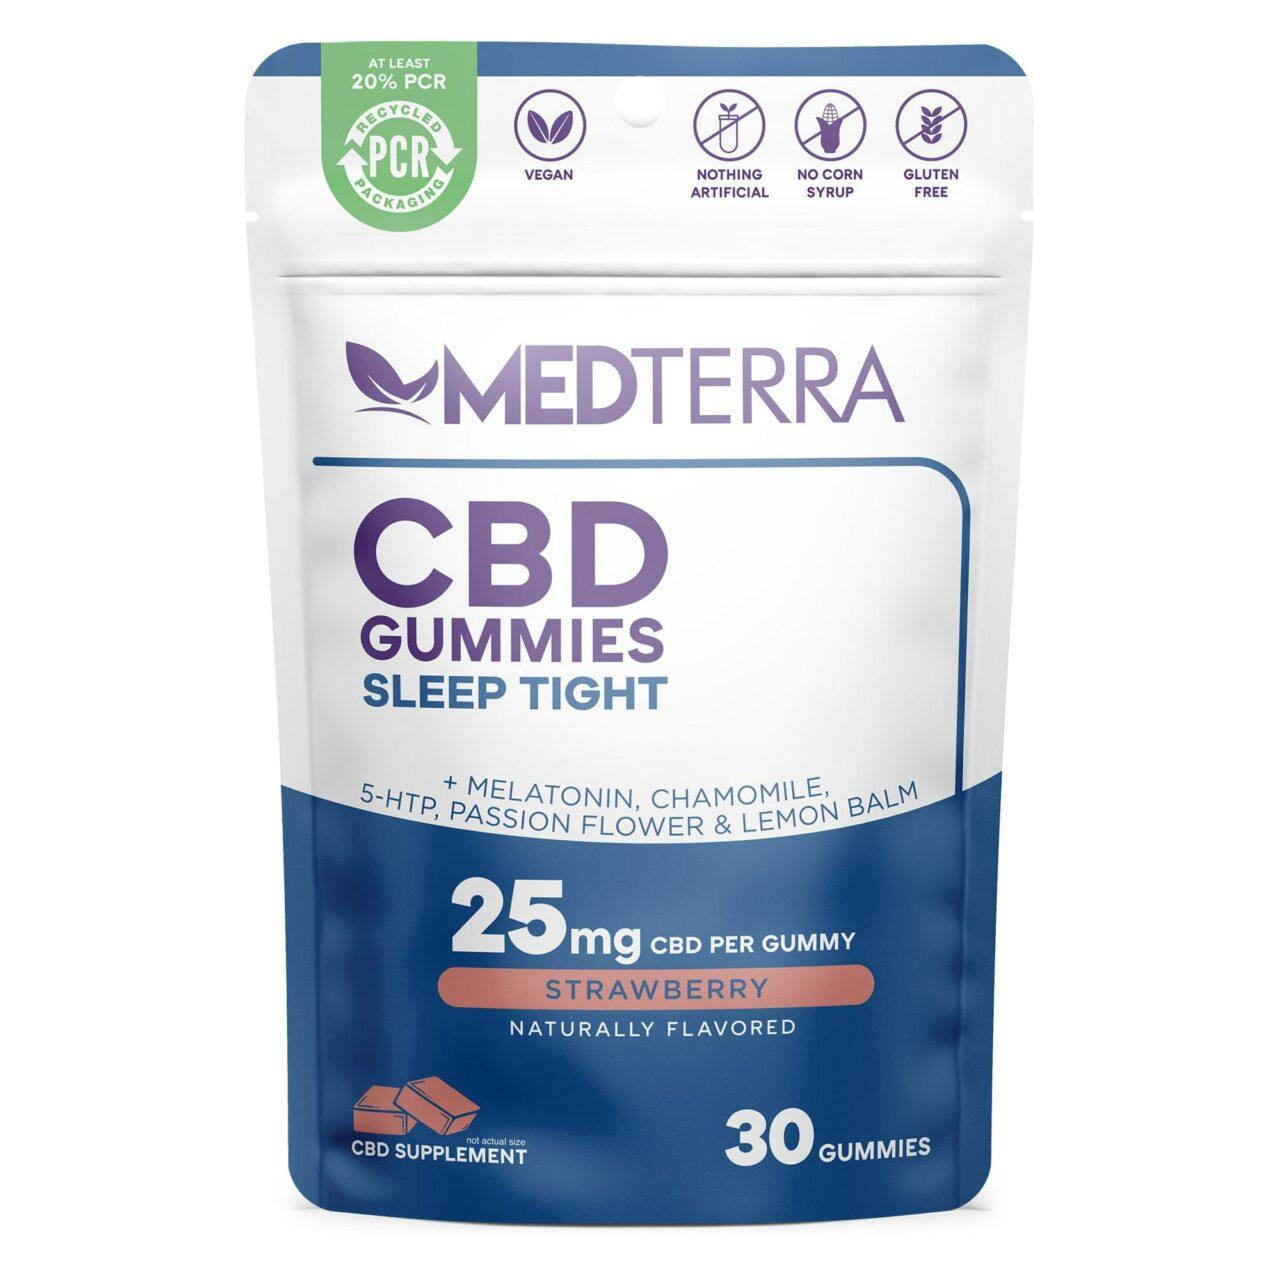 Medterra, CBD Gummies, Sleep Tight, Isolate THC-Free, Strawbery, 30ct, 750mg CBD 1